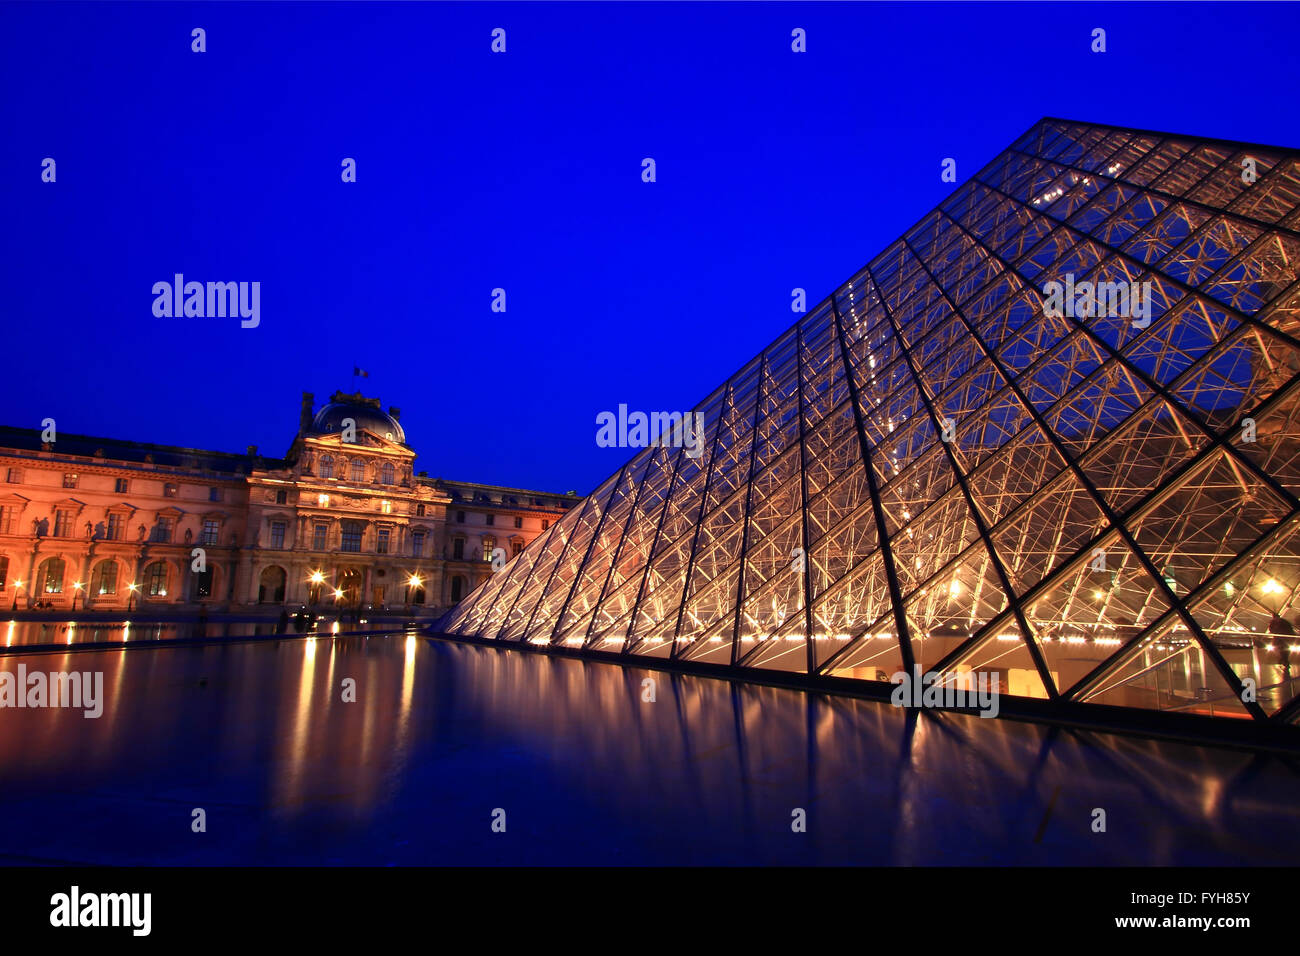 PARIS - APRIL 16: Closeup of Louvre Pyramid shines at dusk during the Summer Exhibition April 16 - Stock Image